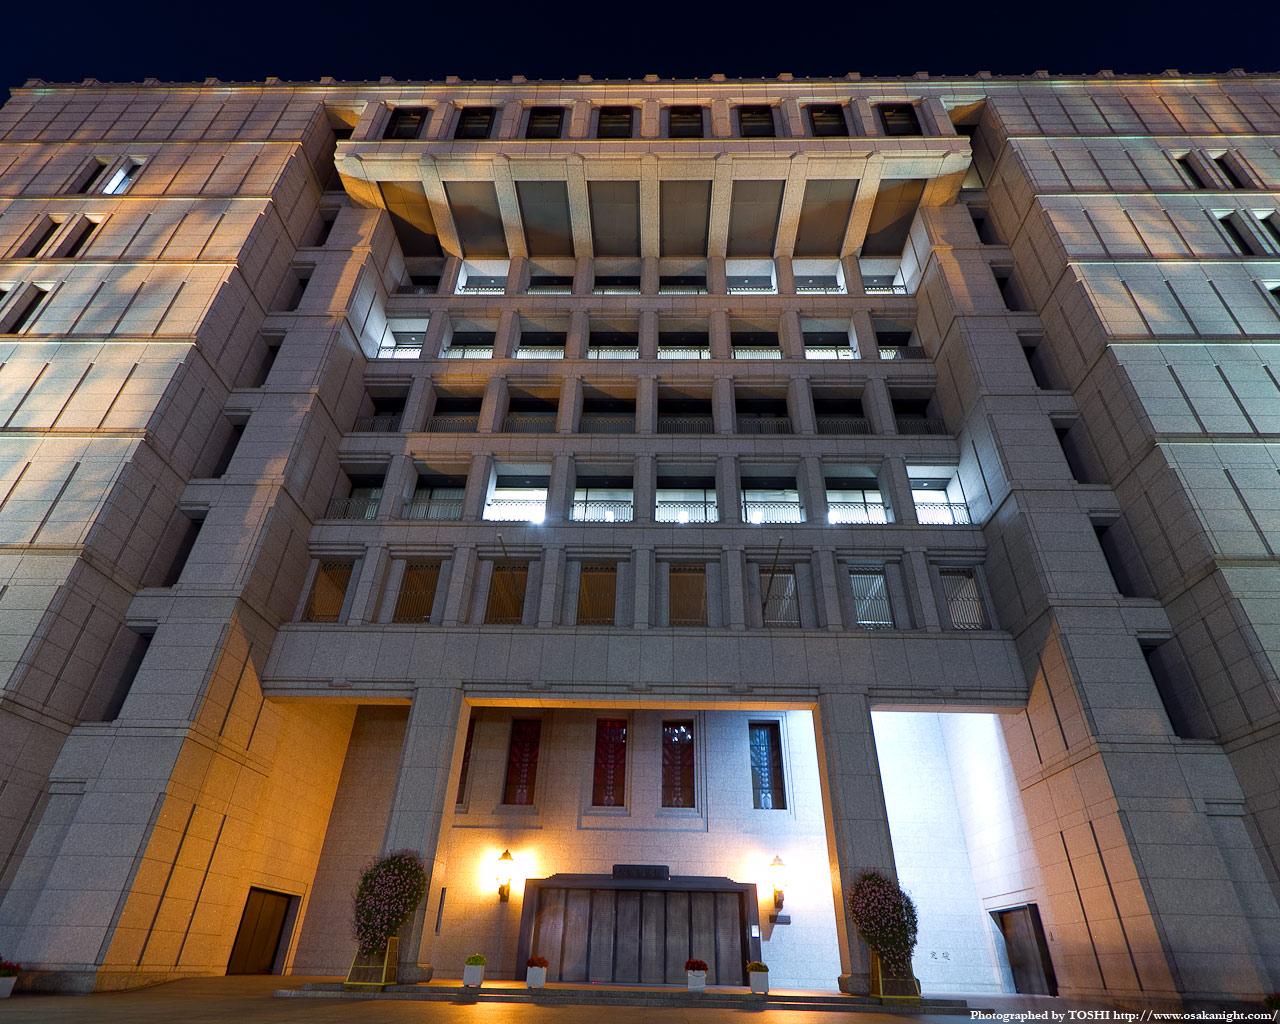 大阪市役所の夜景2